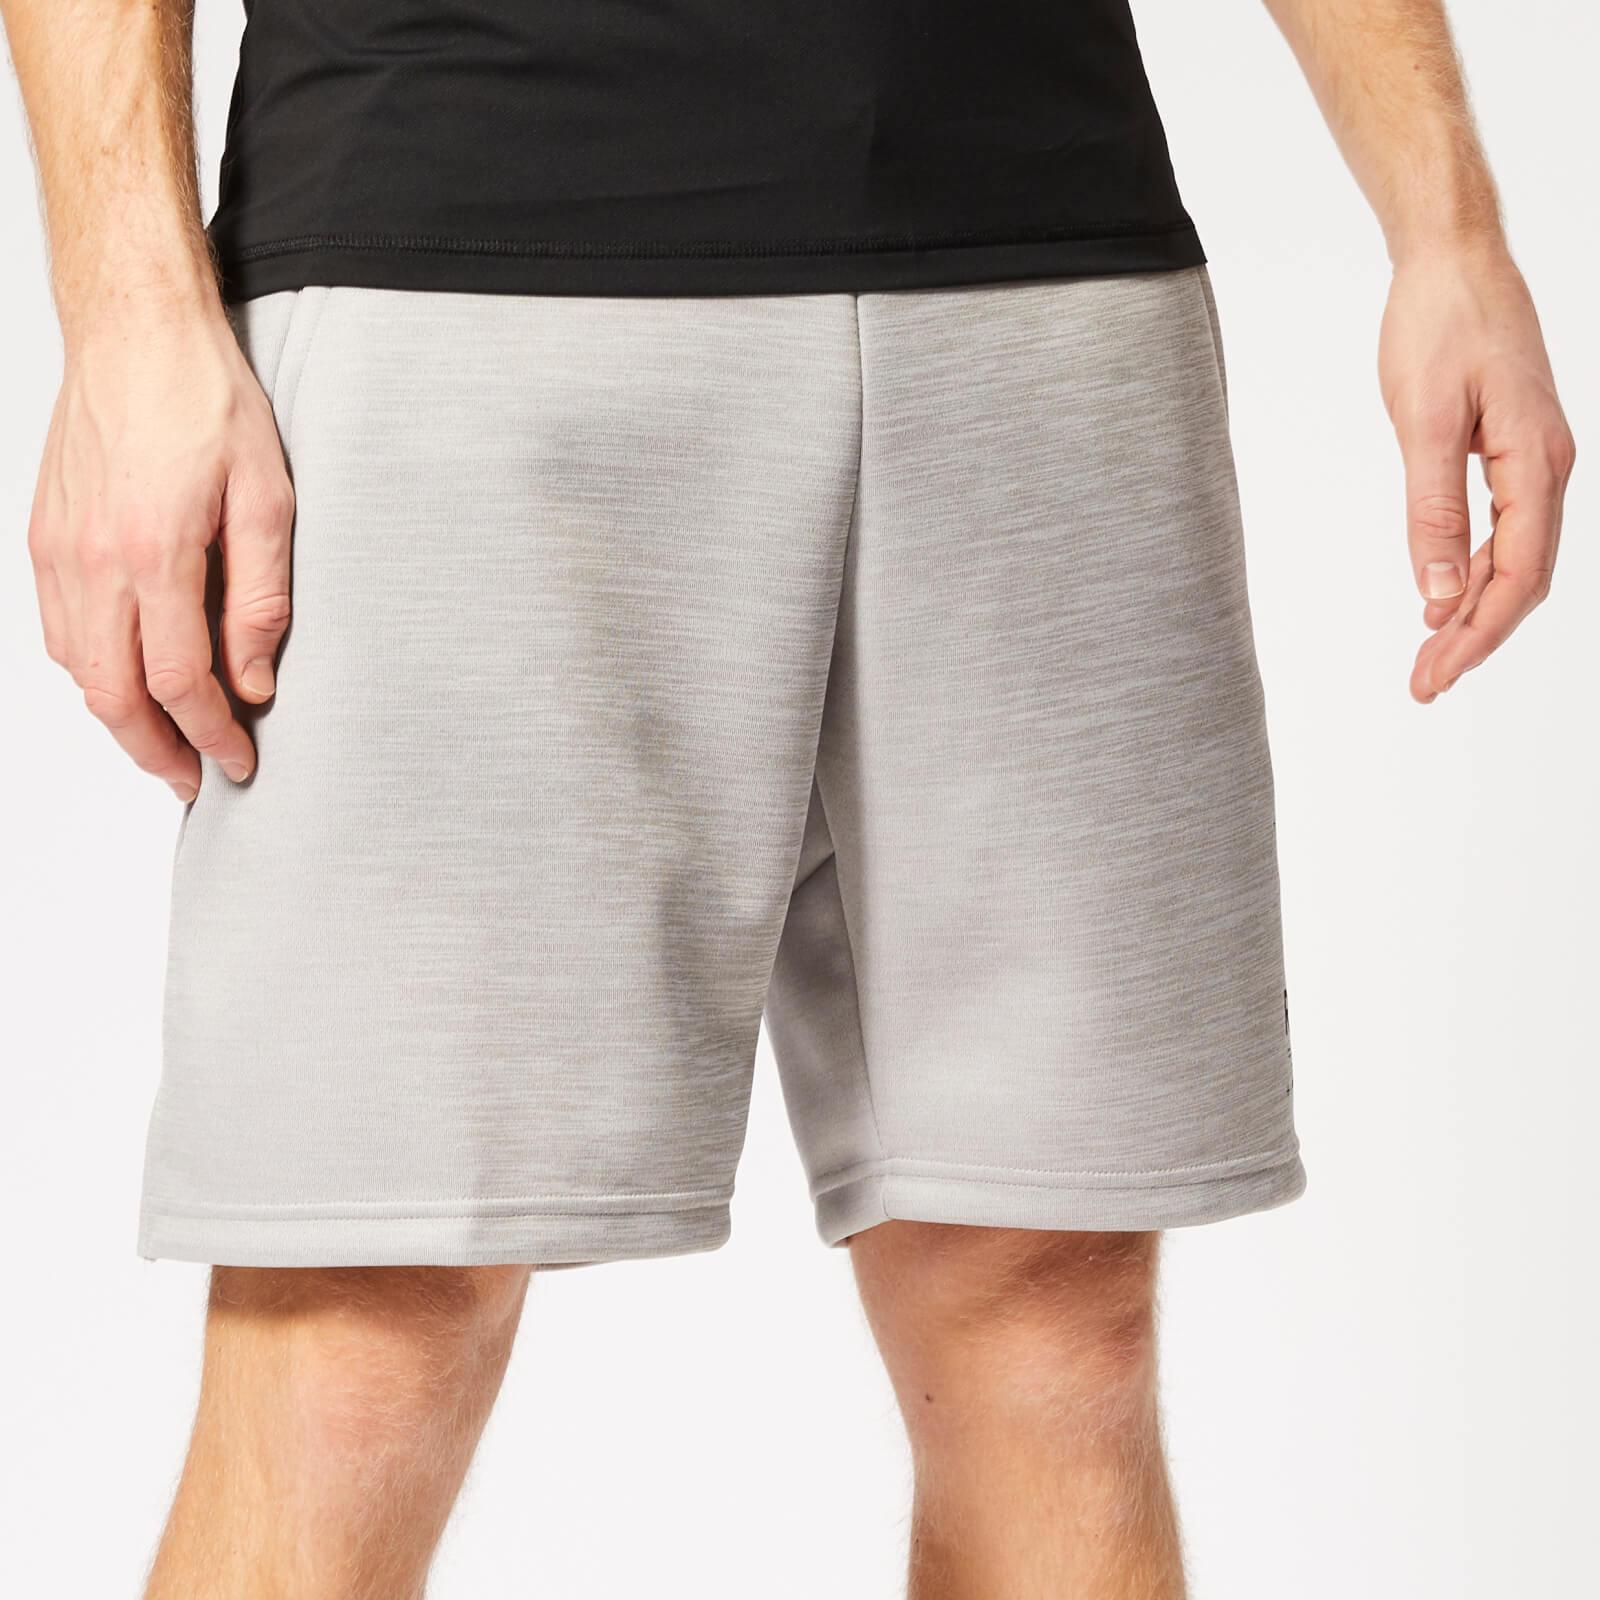 Reebok Men's Spacer Shorts - Grey Heather - S - Grey